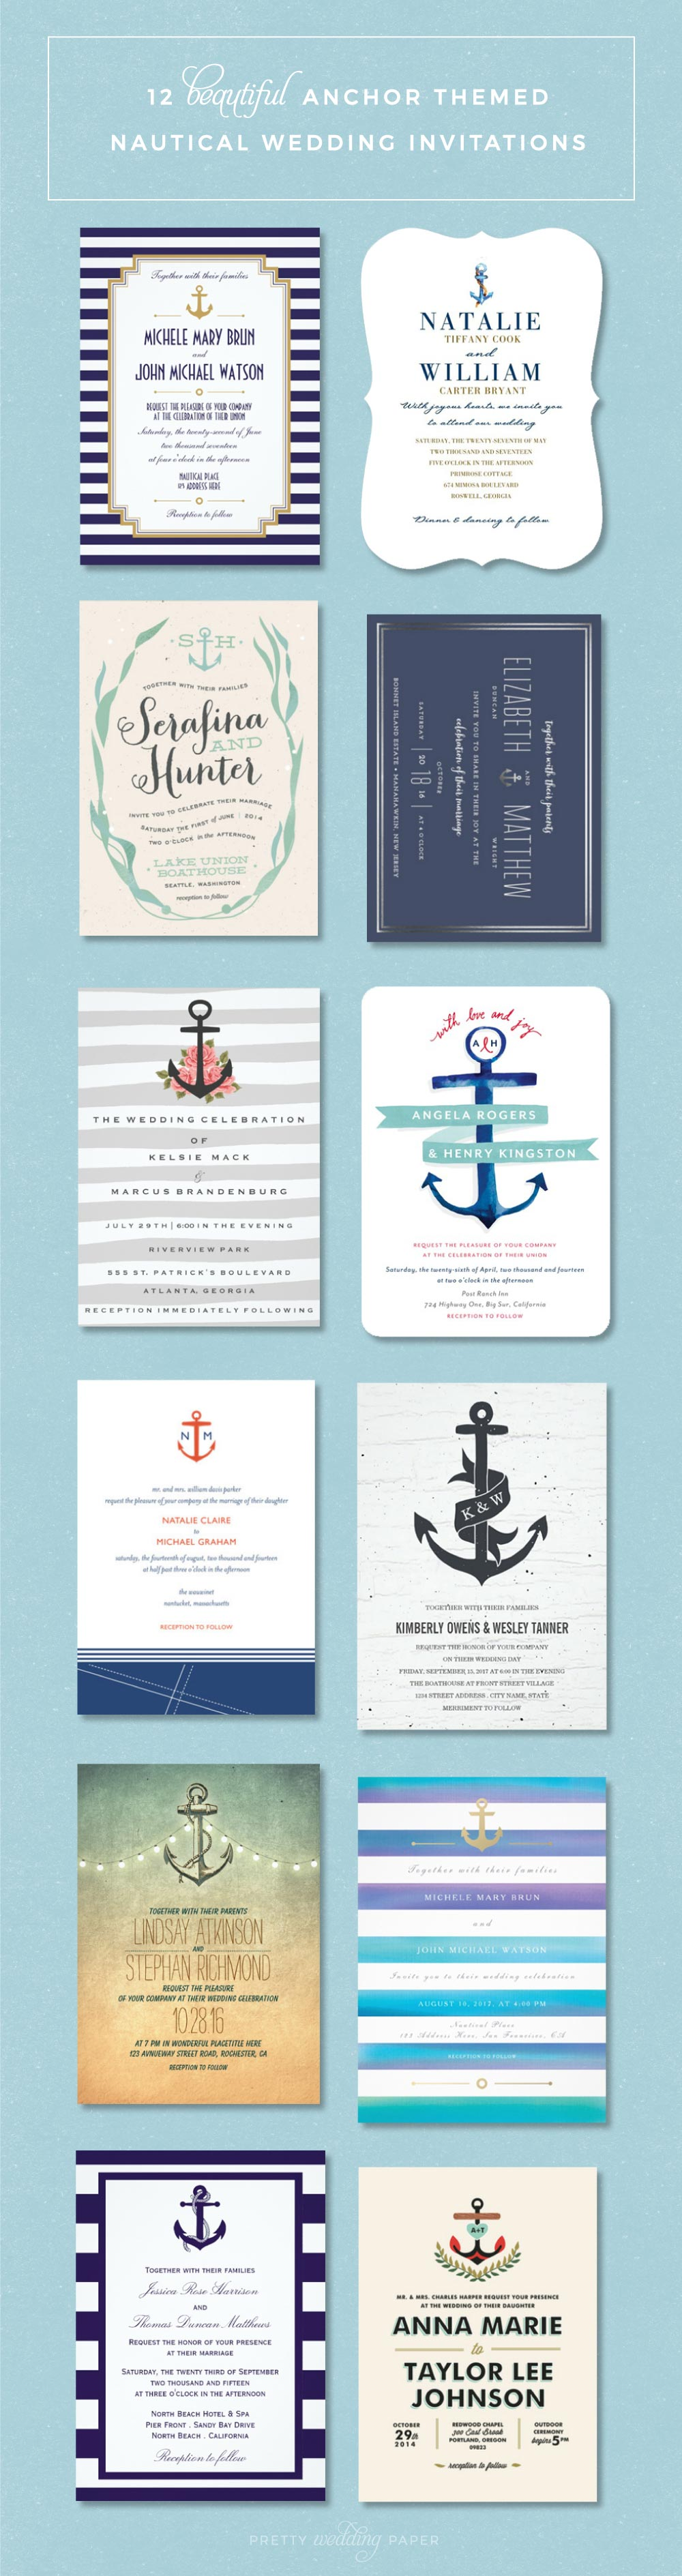 nautical wedding invitations 12 beautiful anchor themed designs